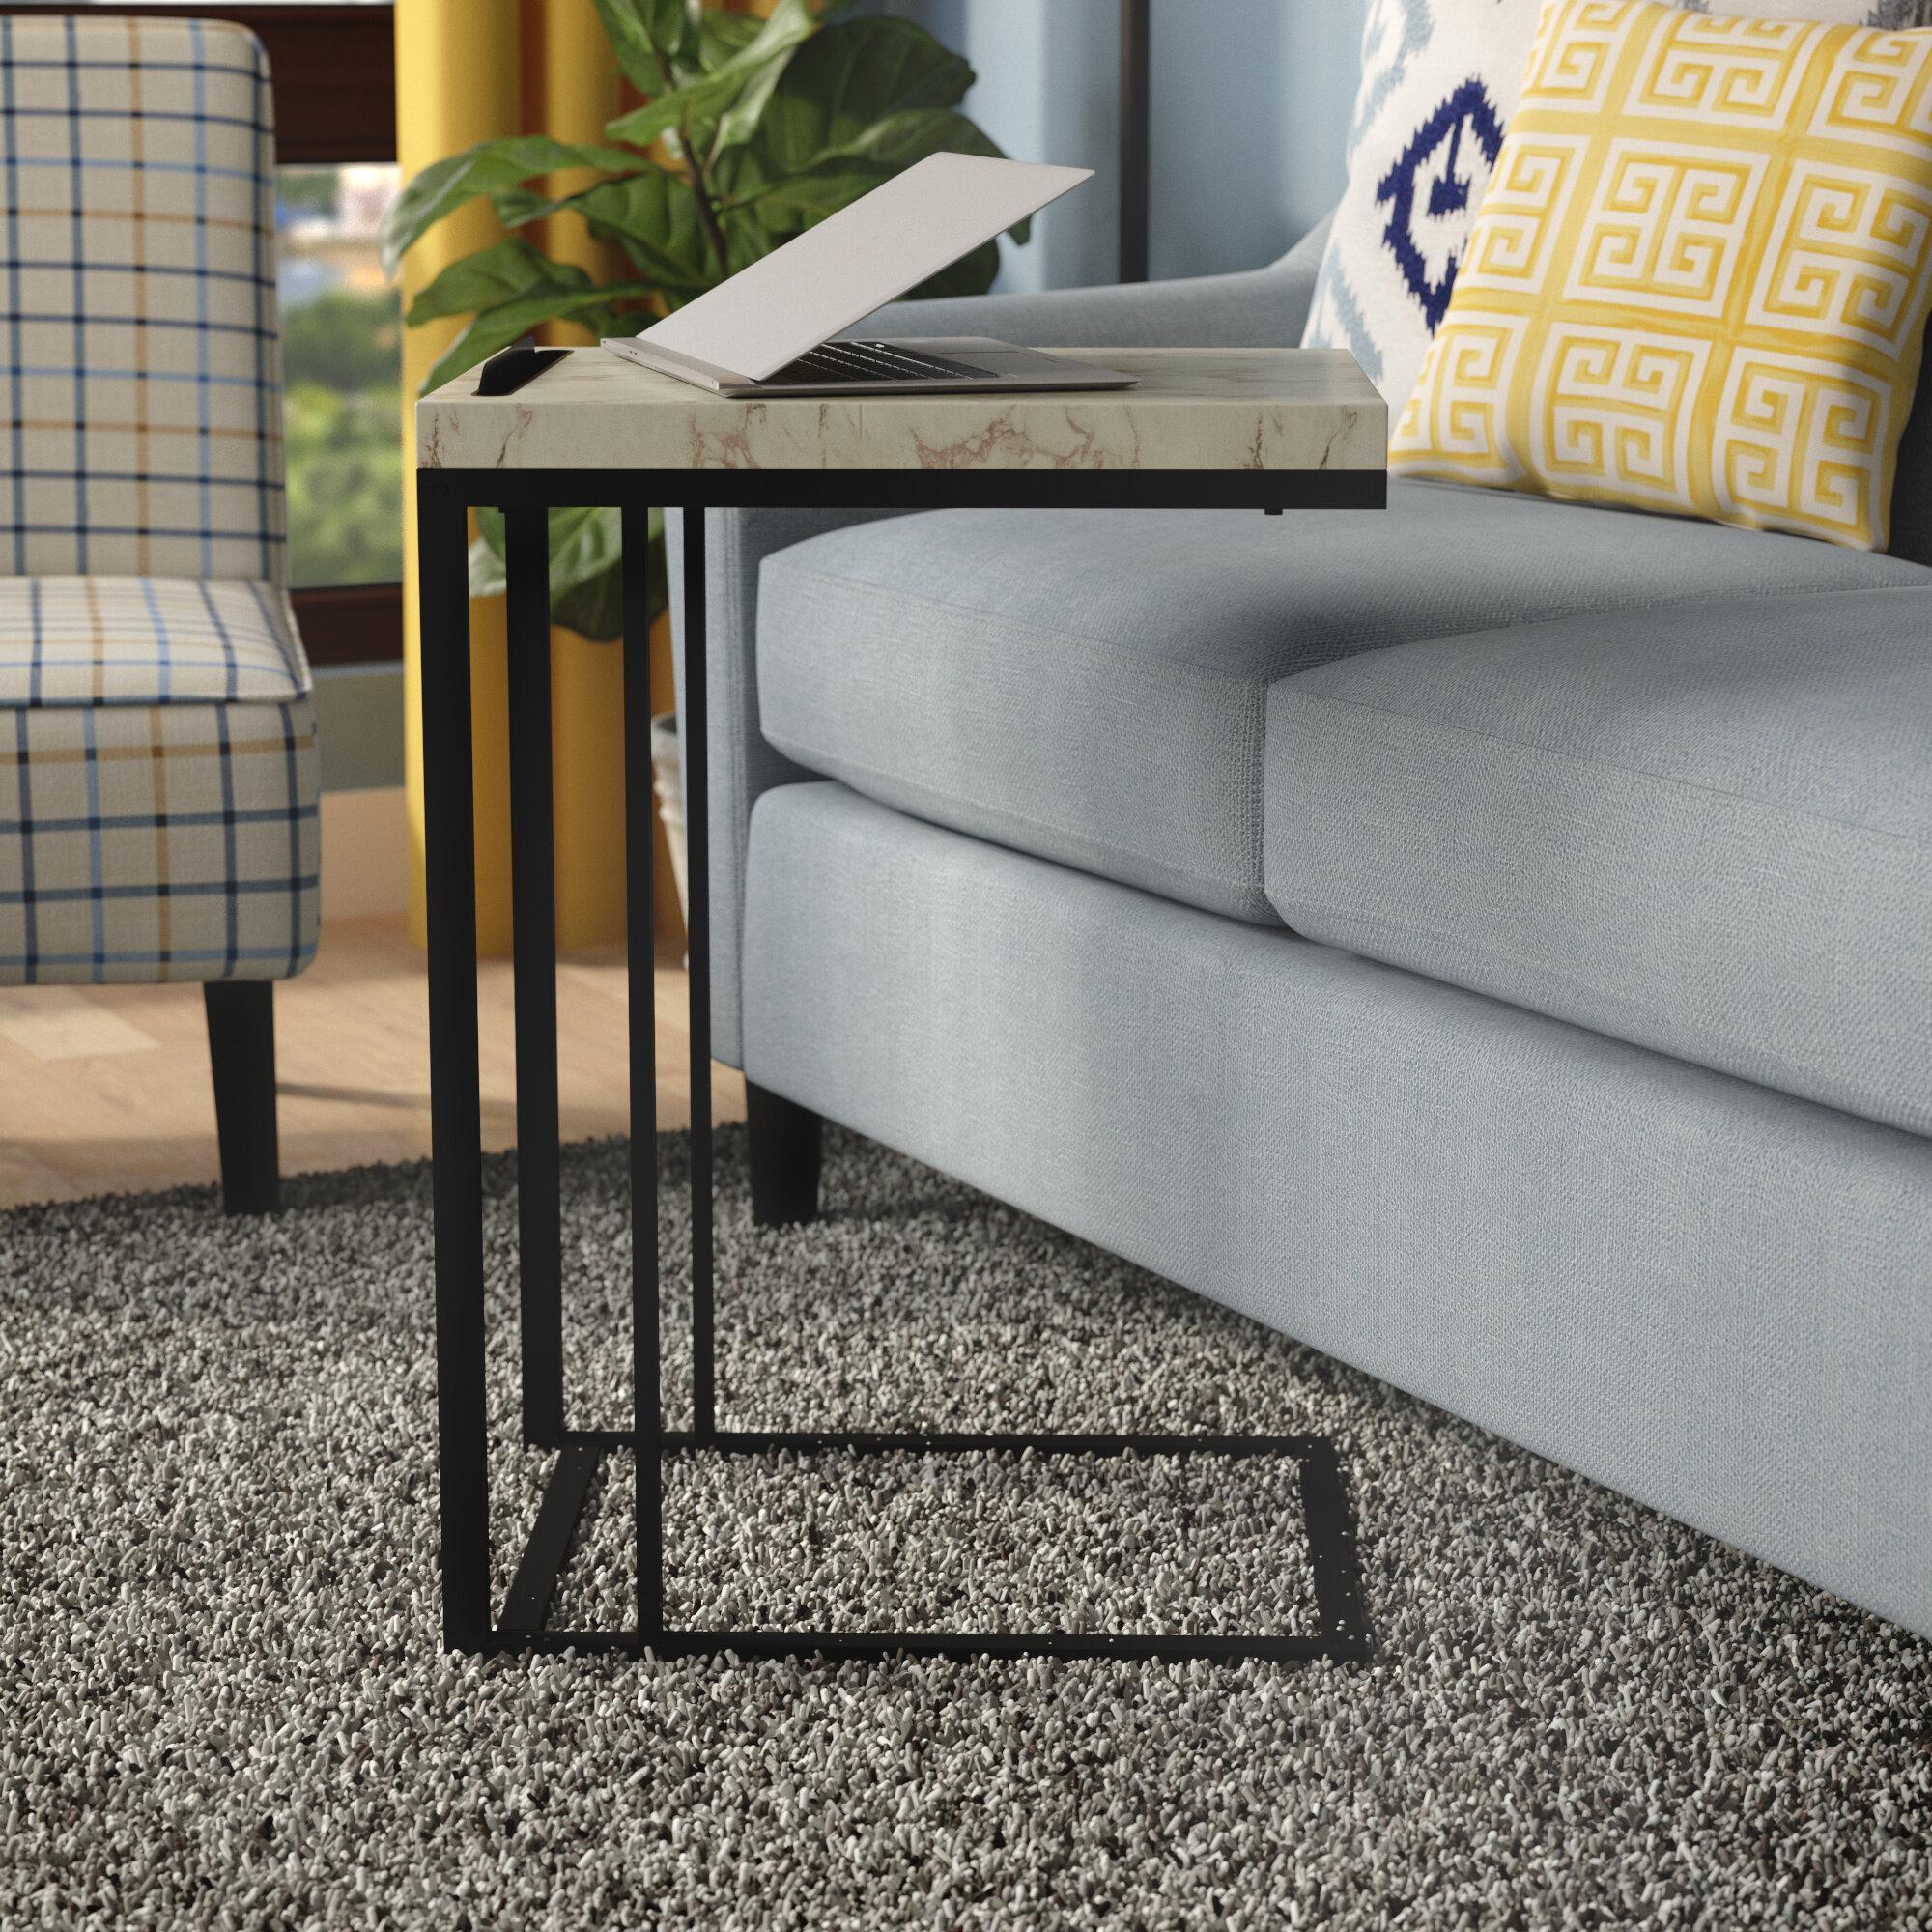 Conklin Slide Under Sofa End Table